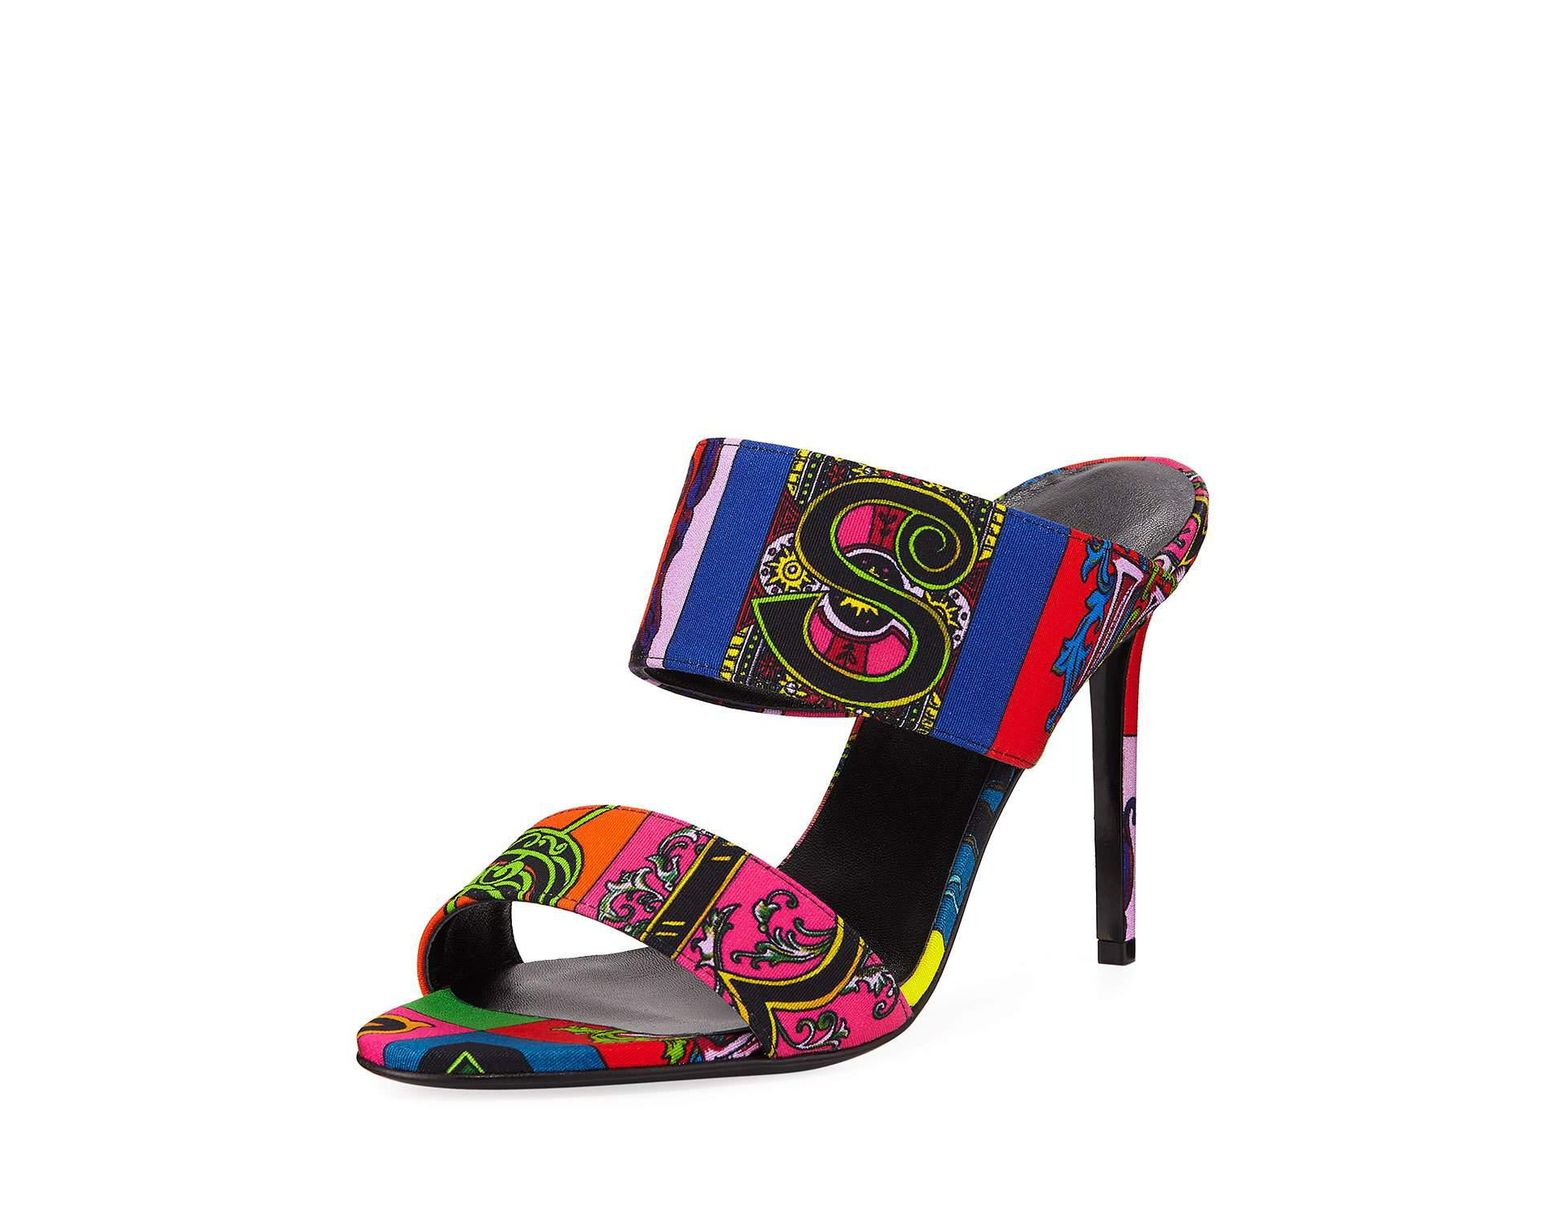 a8dbb41fb5 Versace Alphabet Printed Sandal Sandal Slides in Blue - Lyst